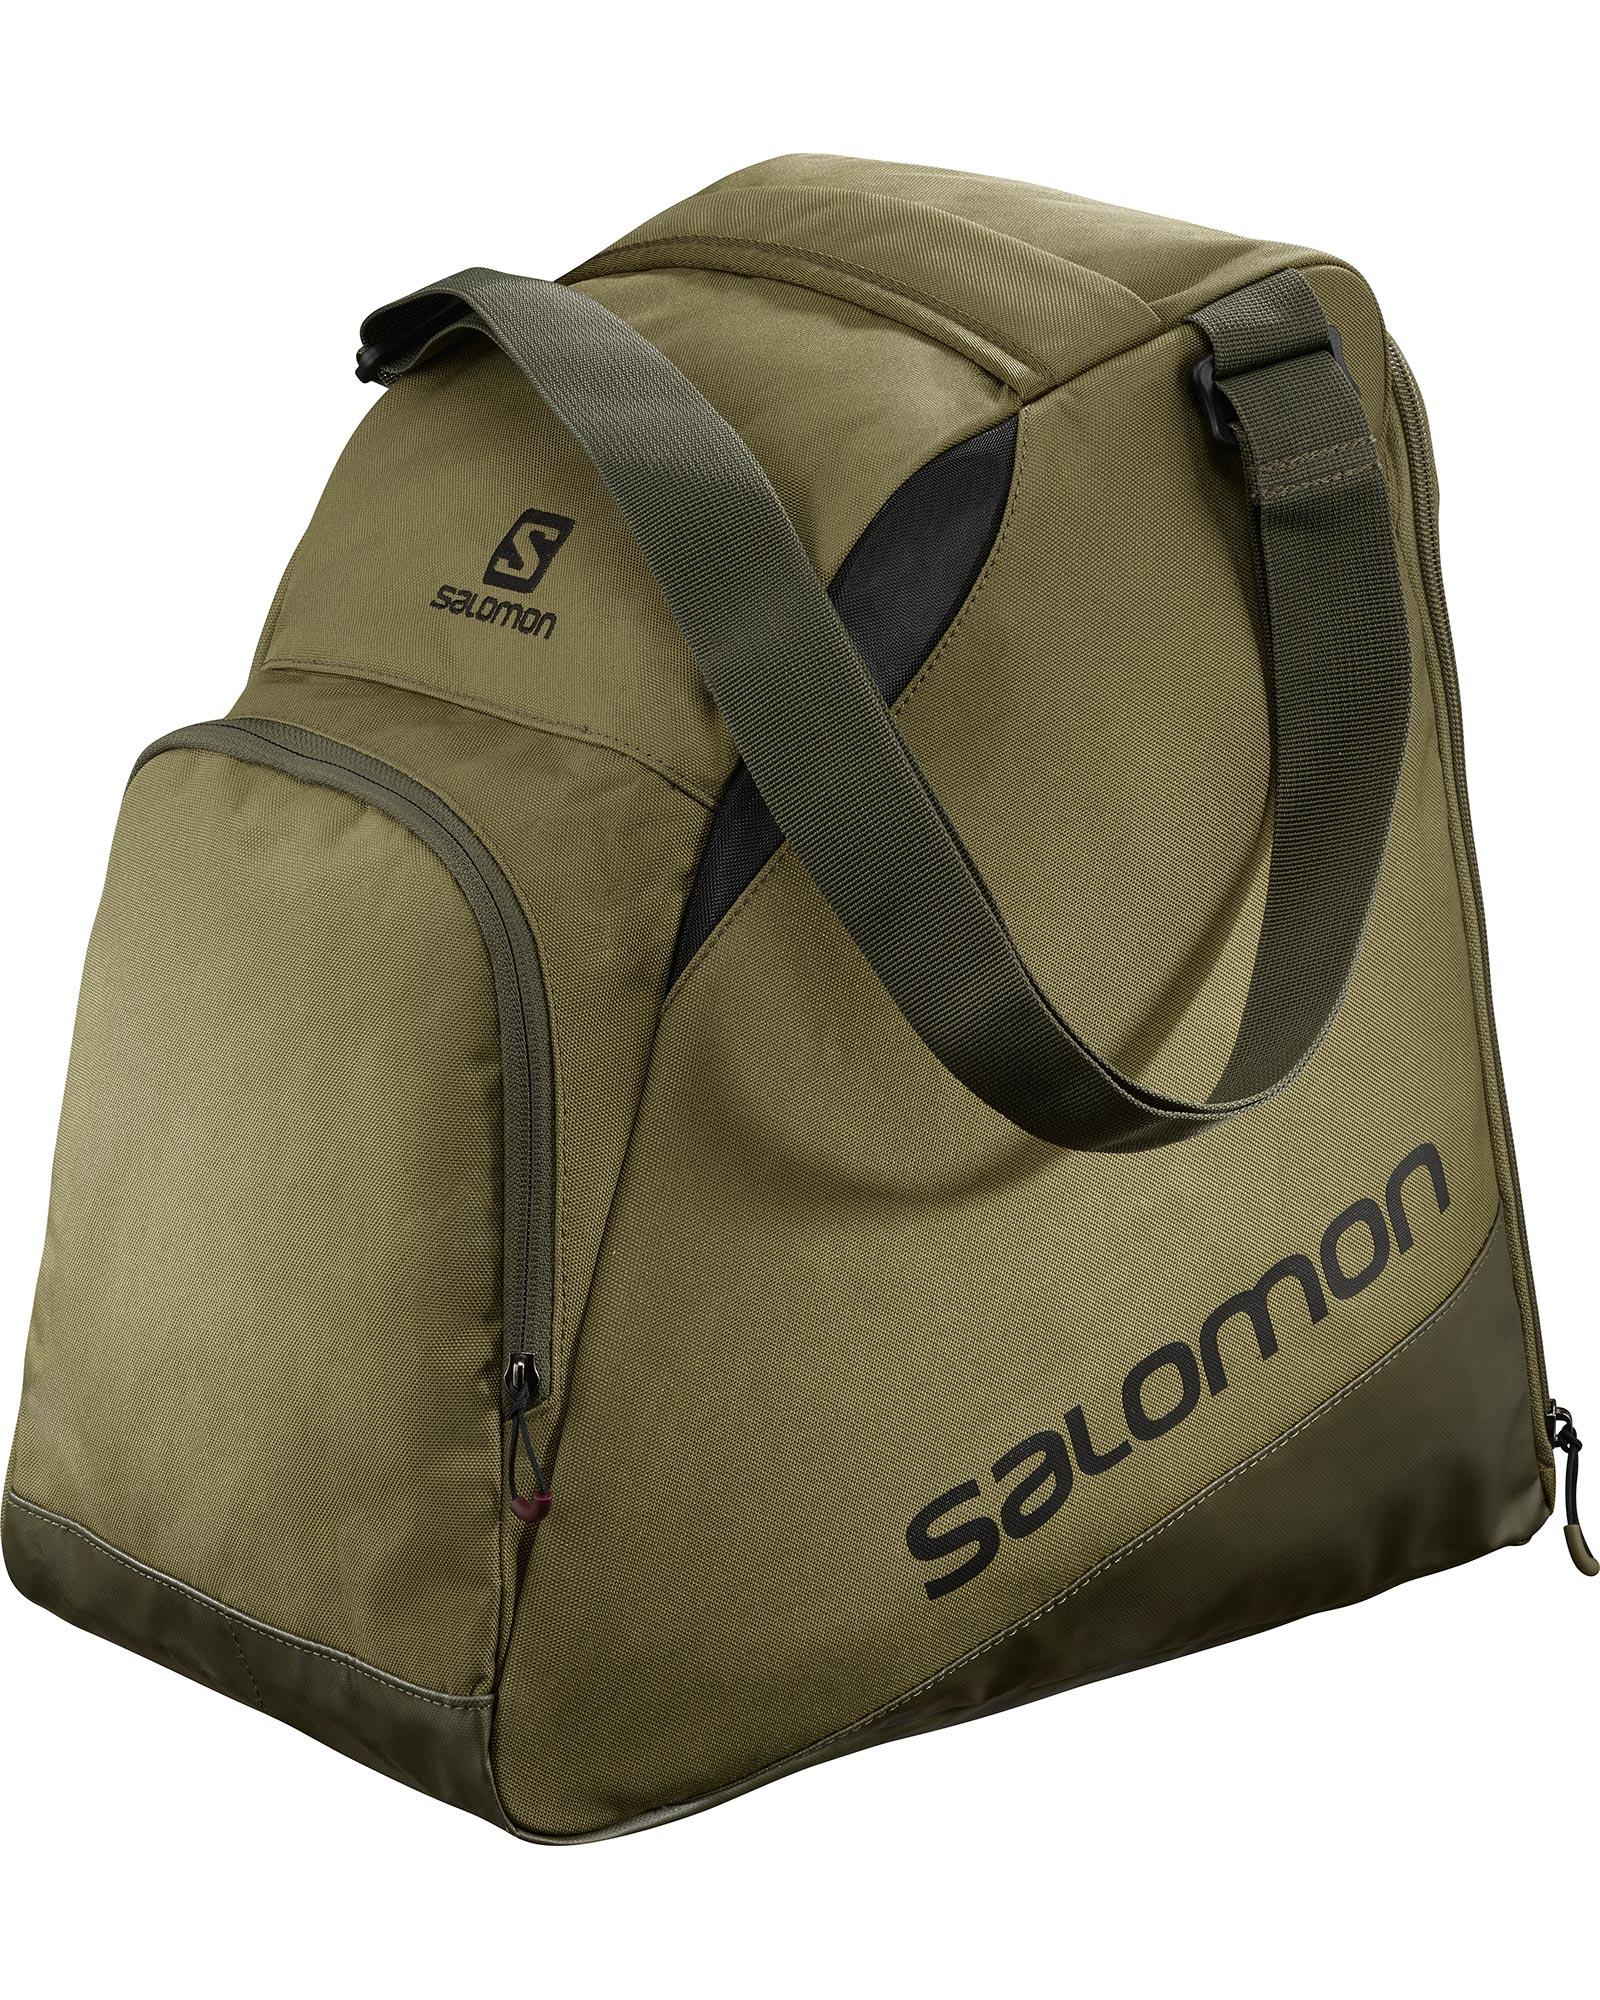 Salomon Extend Gear Bag 0